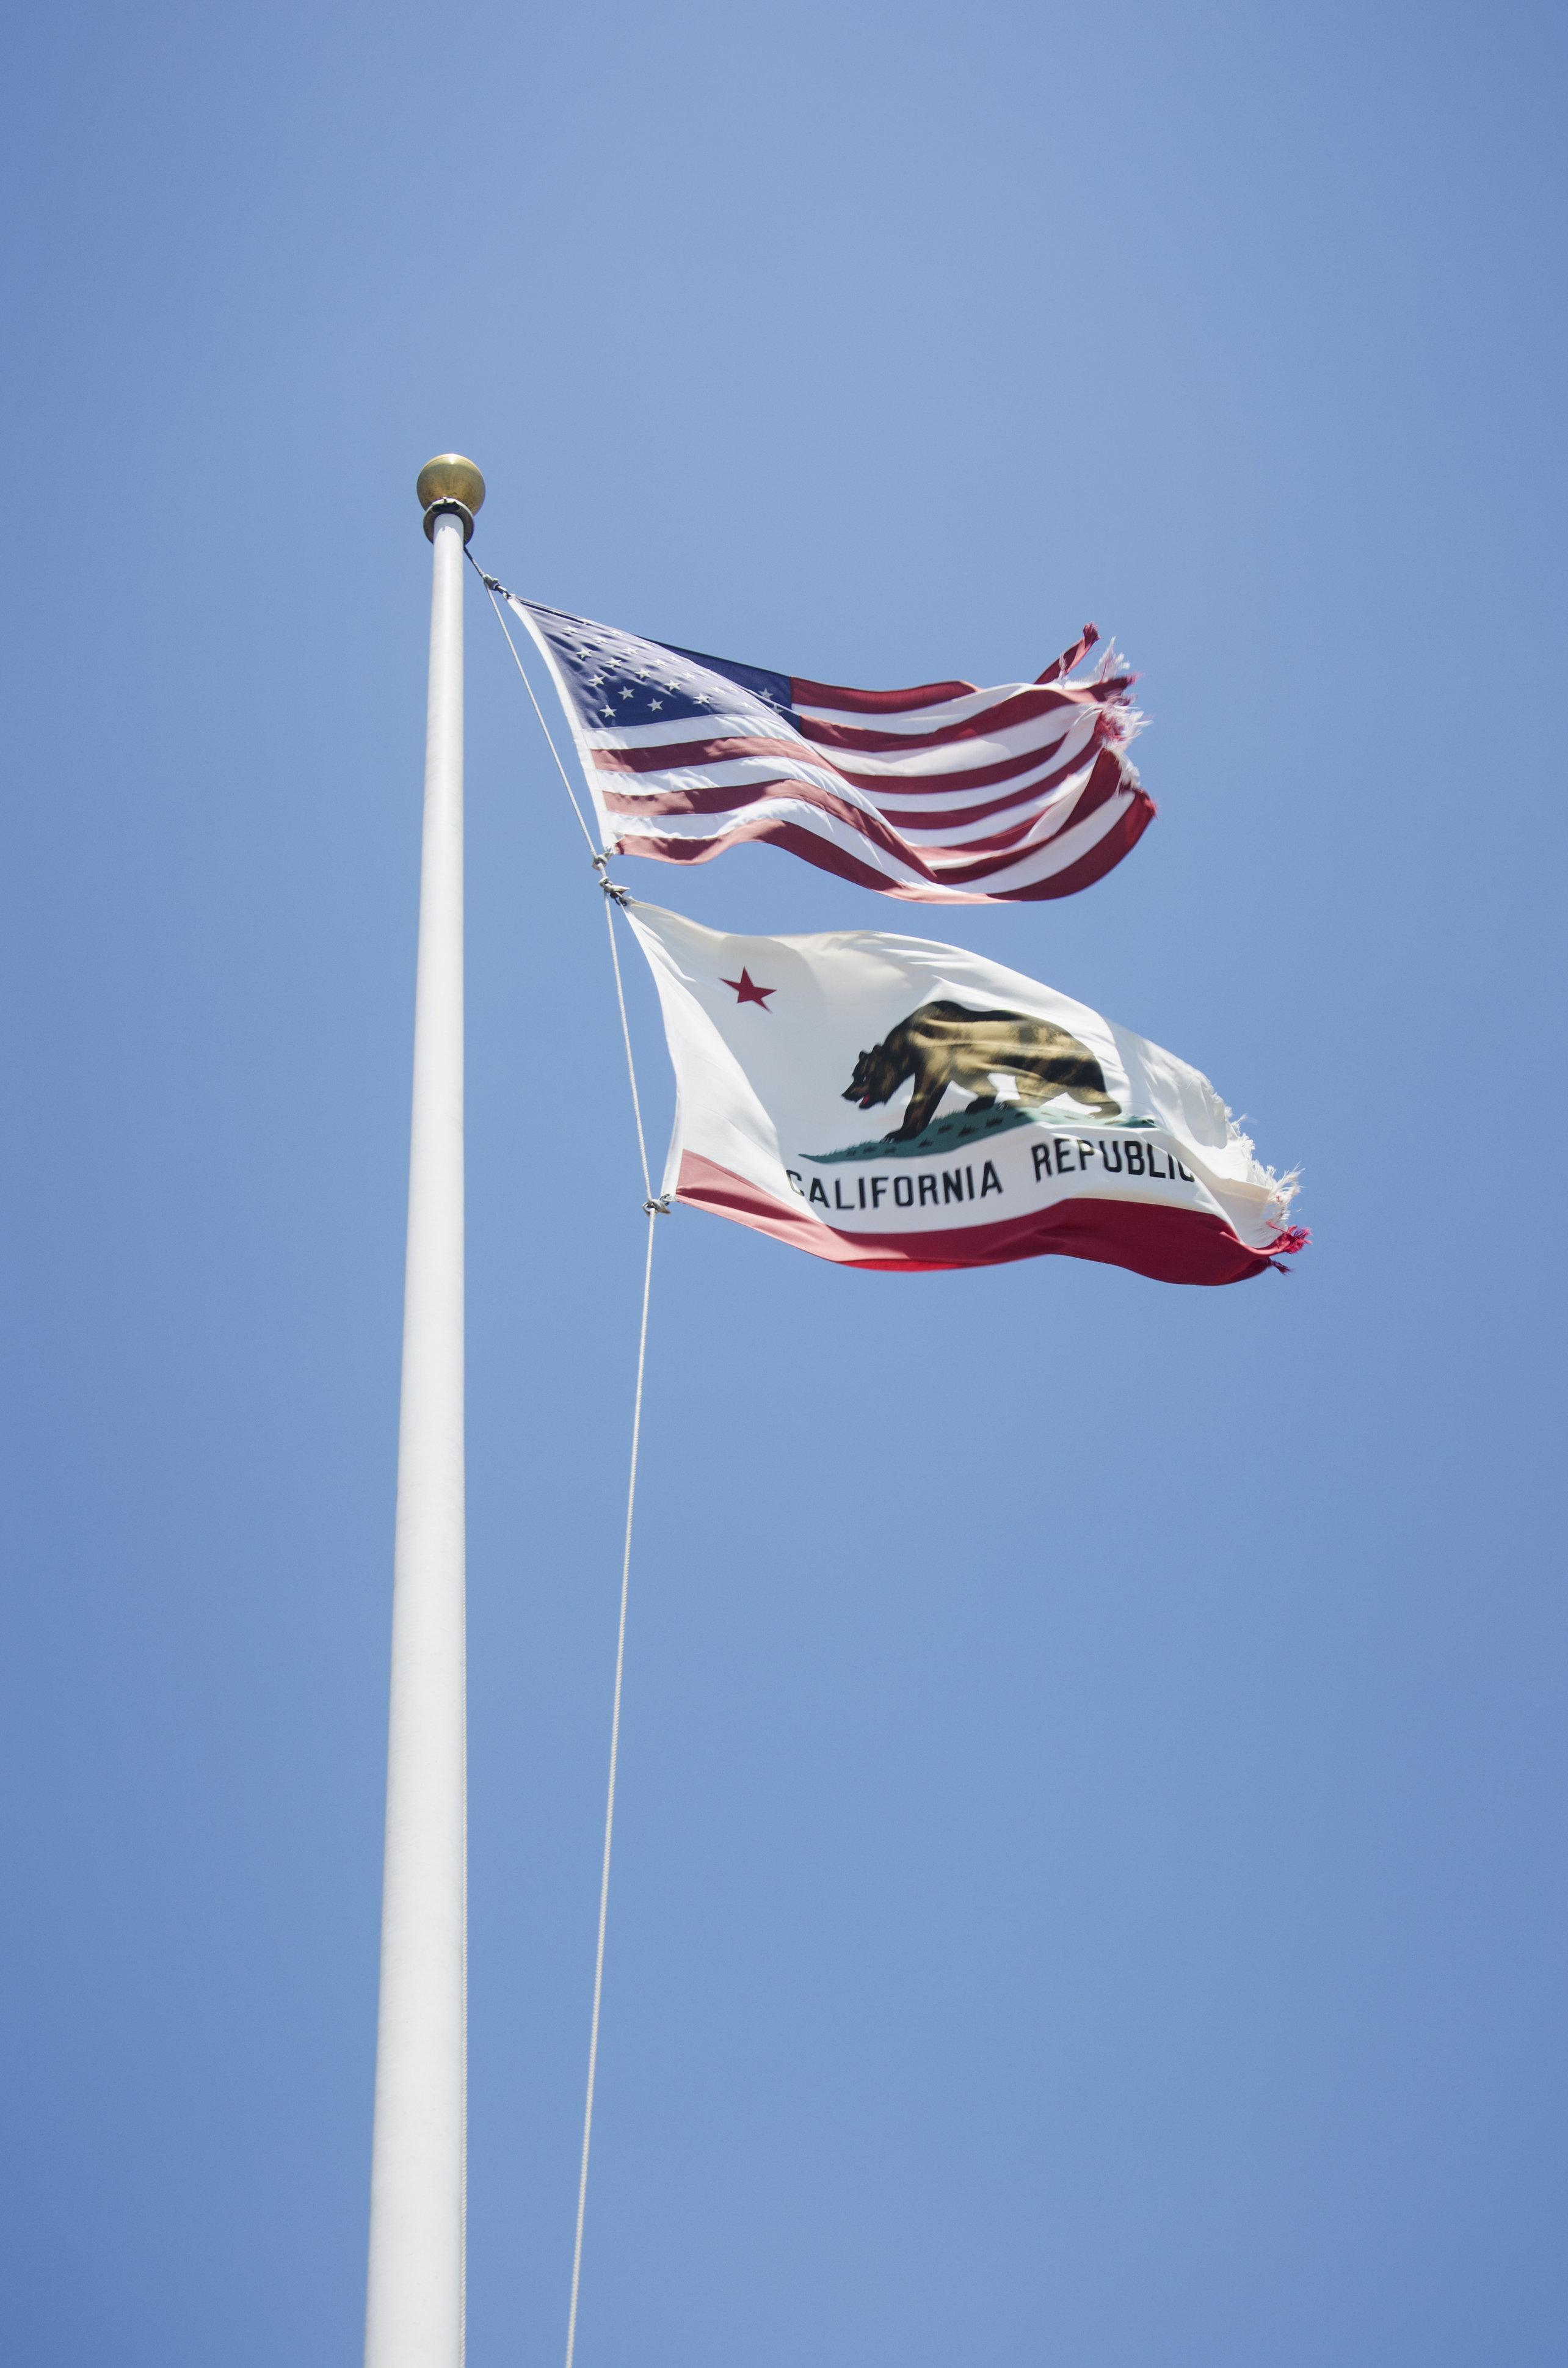 American and California state flag, San Francisco, California, USA.